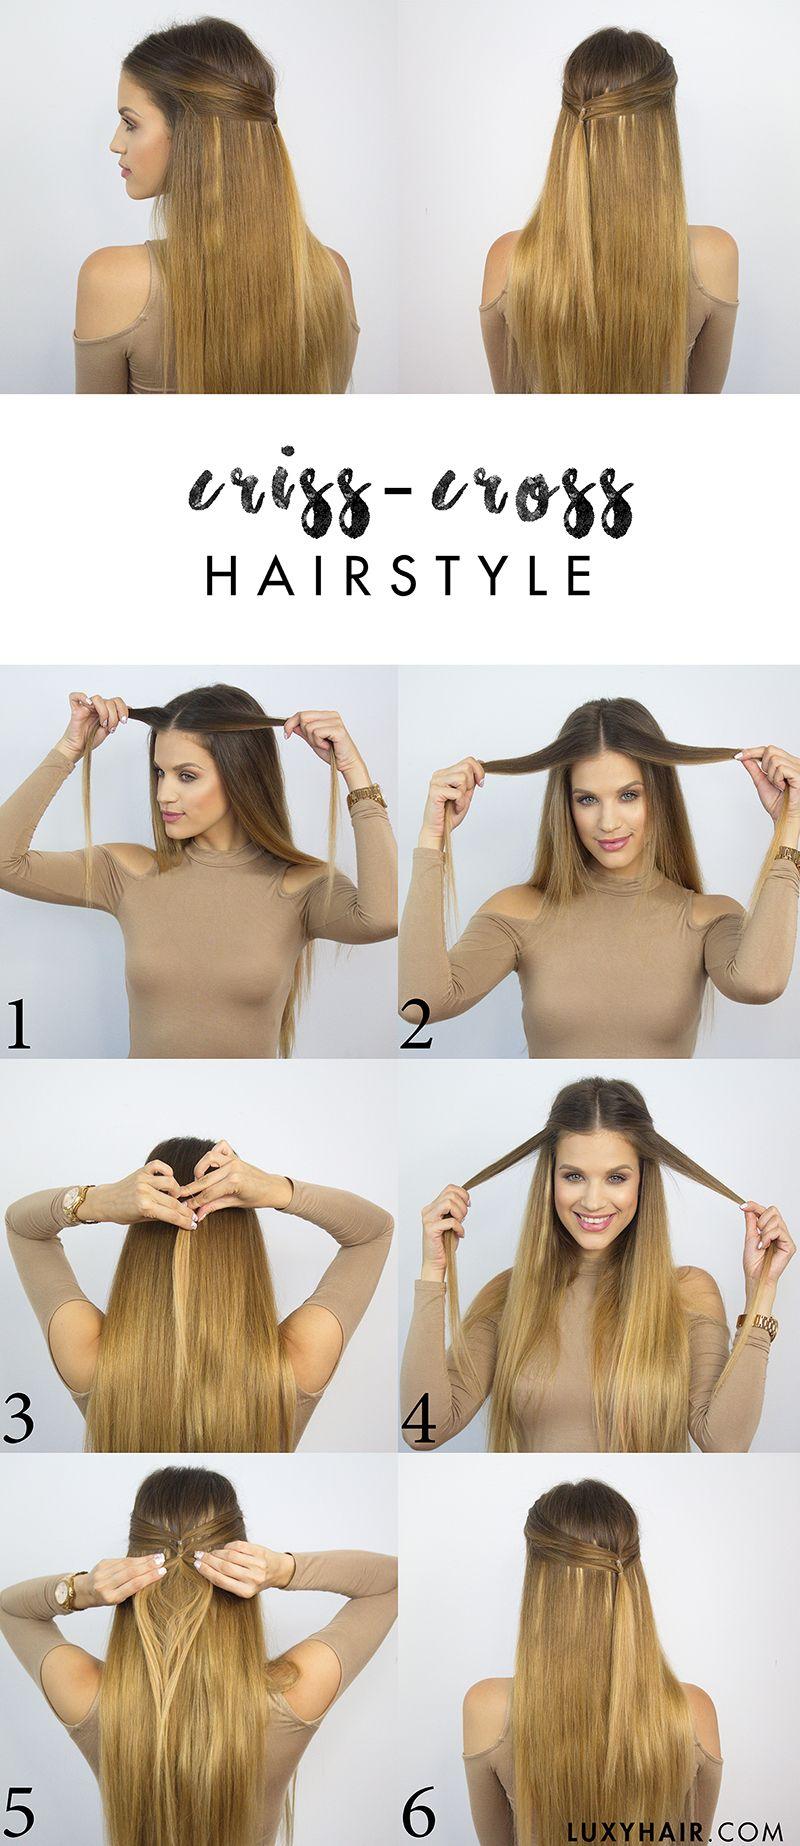 Cute Heatless Hairstyles for School   Cute hairstyles for teens ...